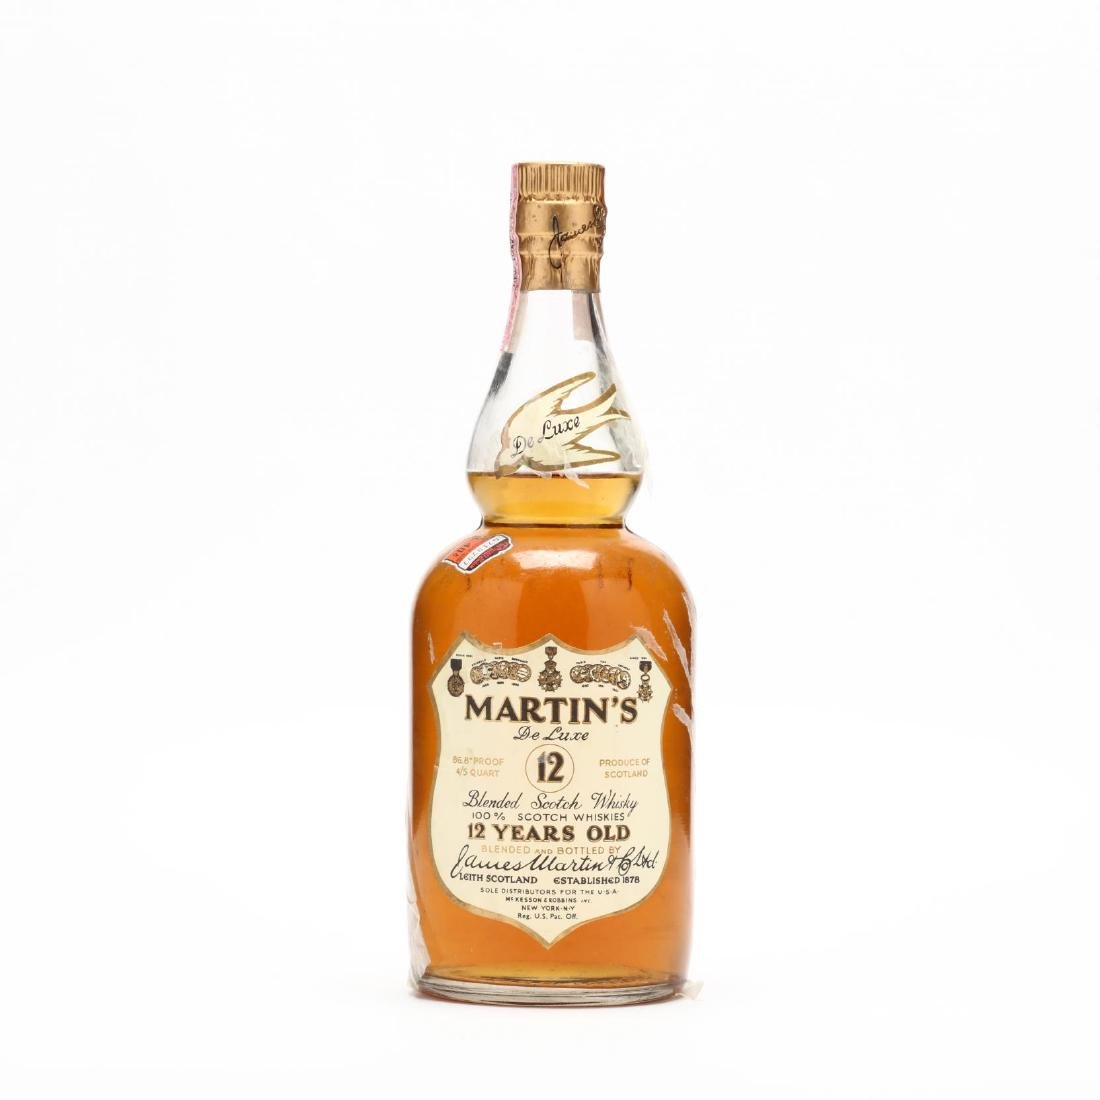 Martin's Blended Scotch Whisky